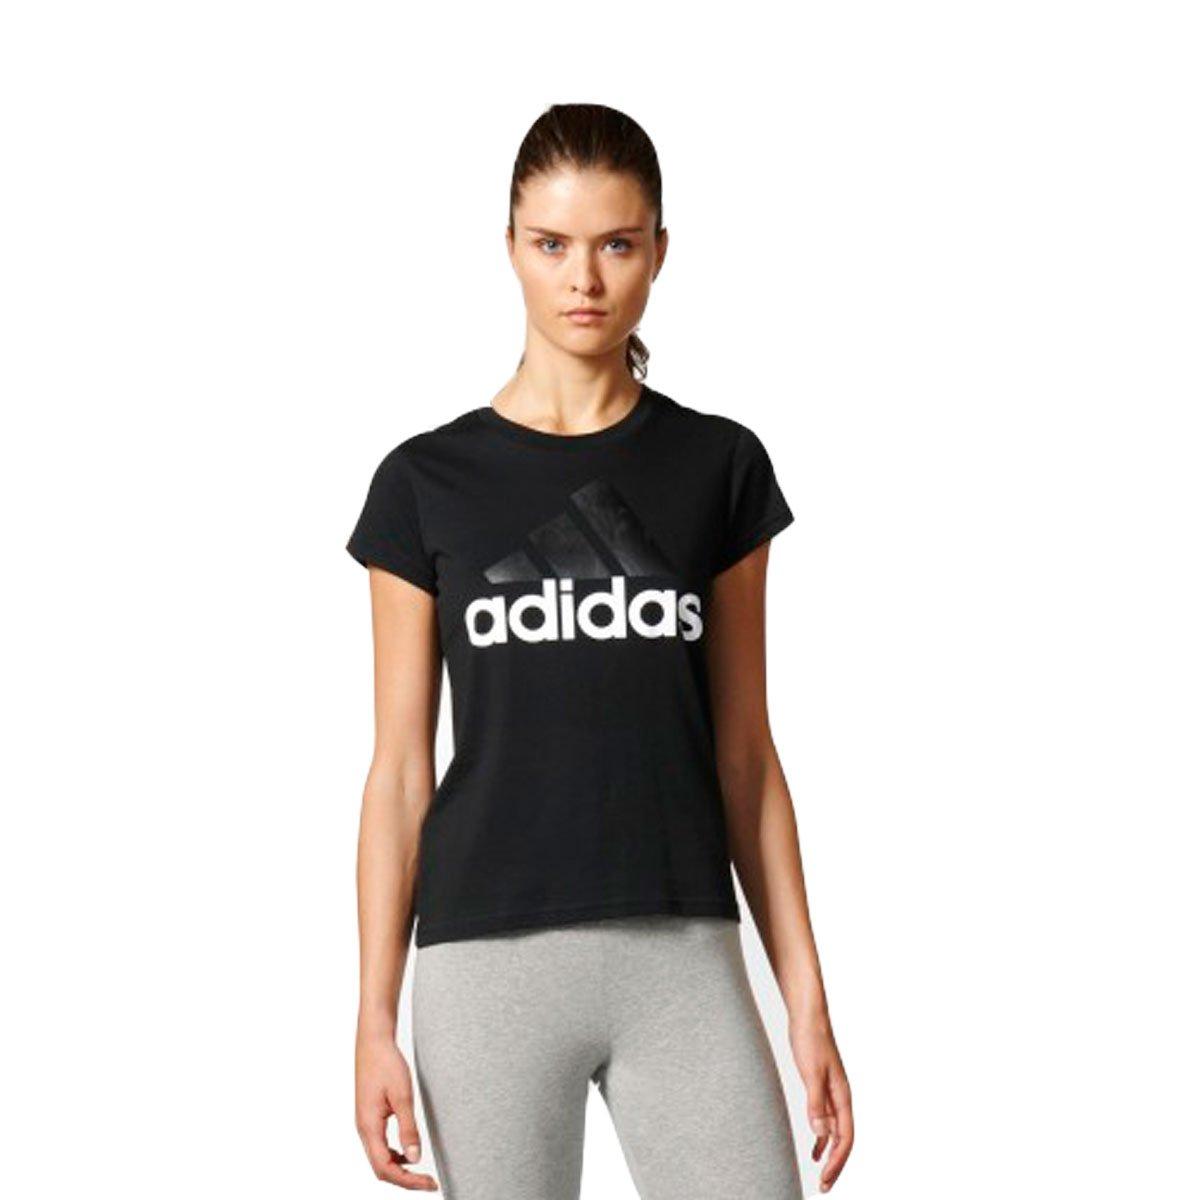 Bizz Store - Camiseta Feminina Adidas Essentials Linear Preta ec6f96a0bca